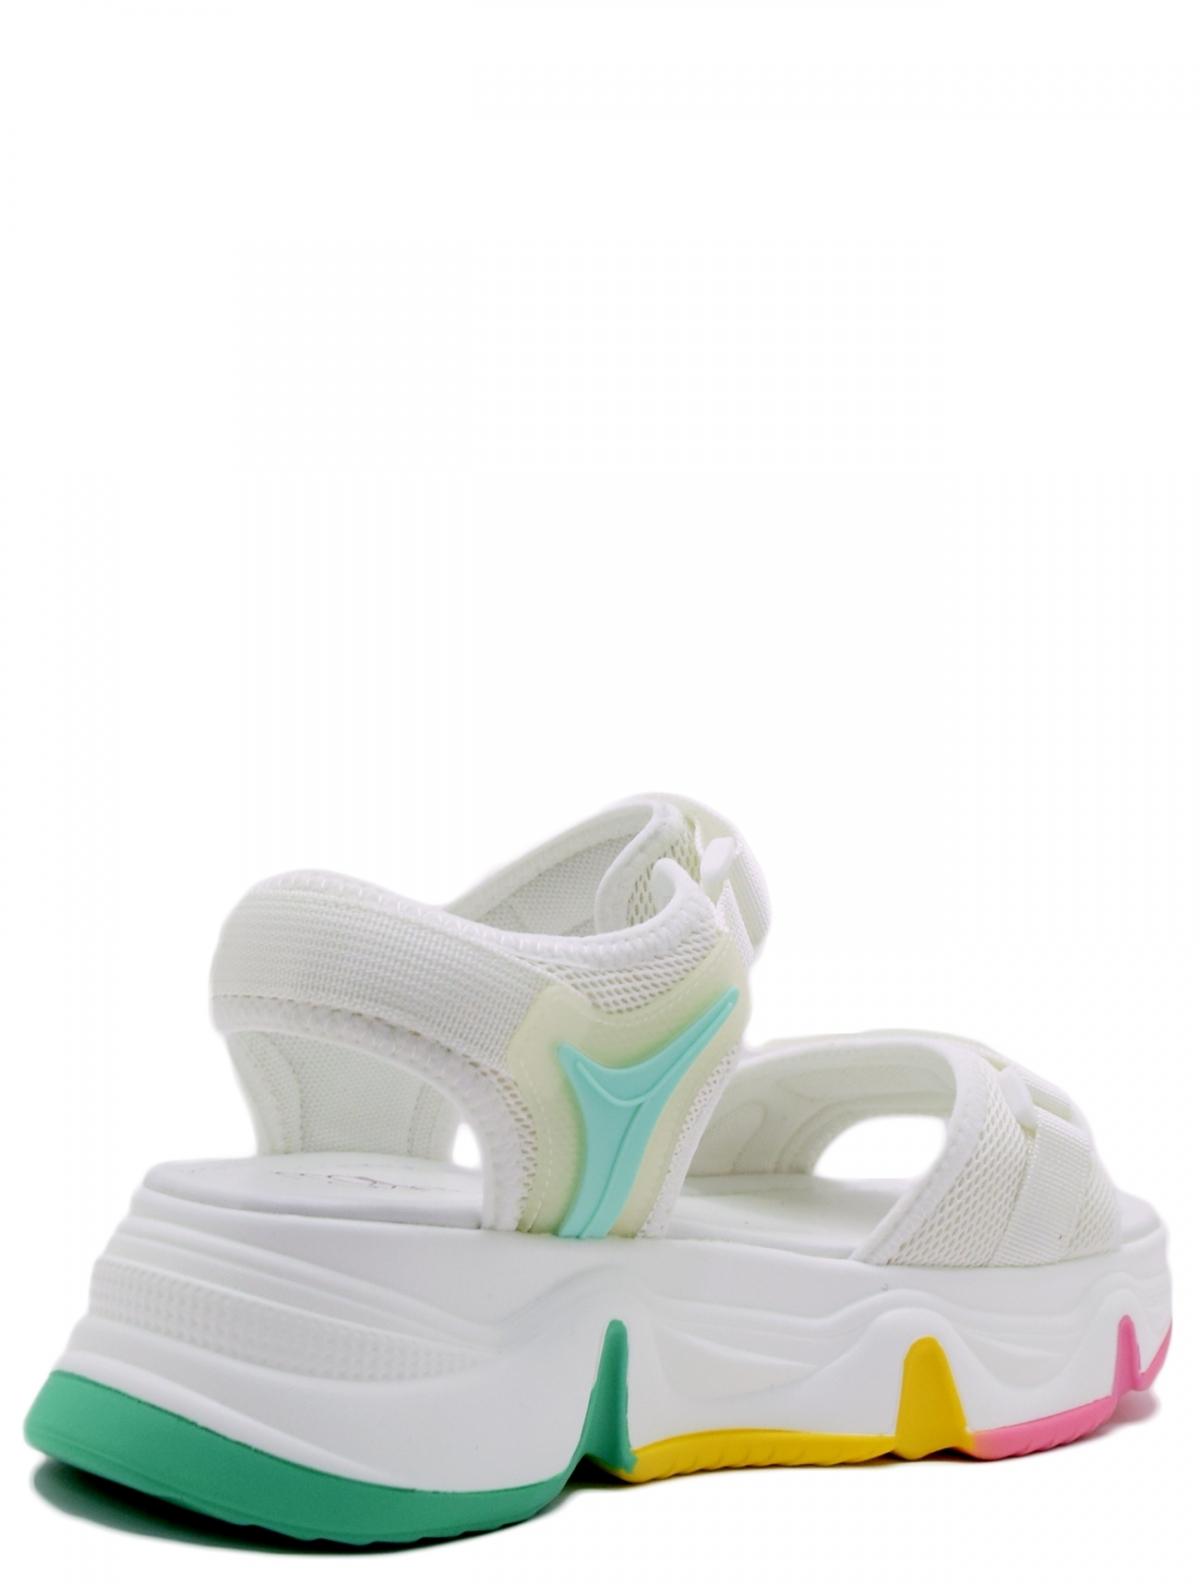 Madella XMG-11583-3B-TT женские сандали